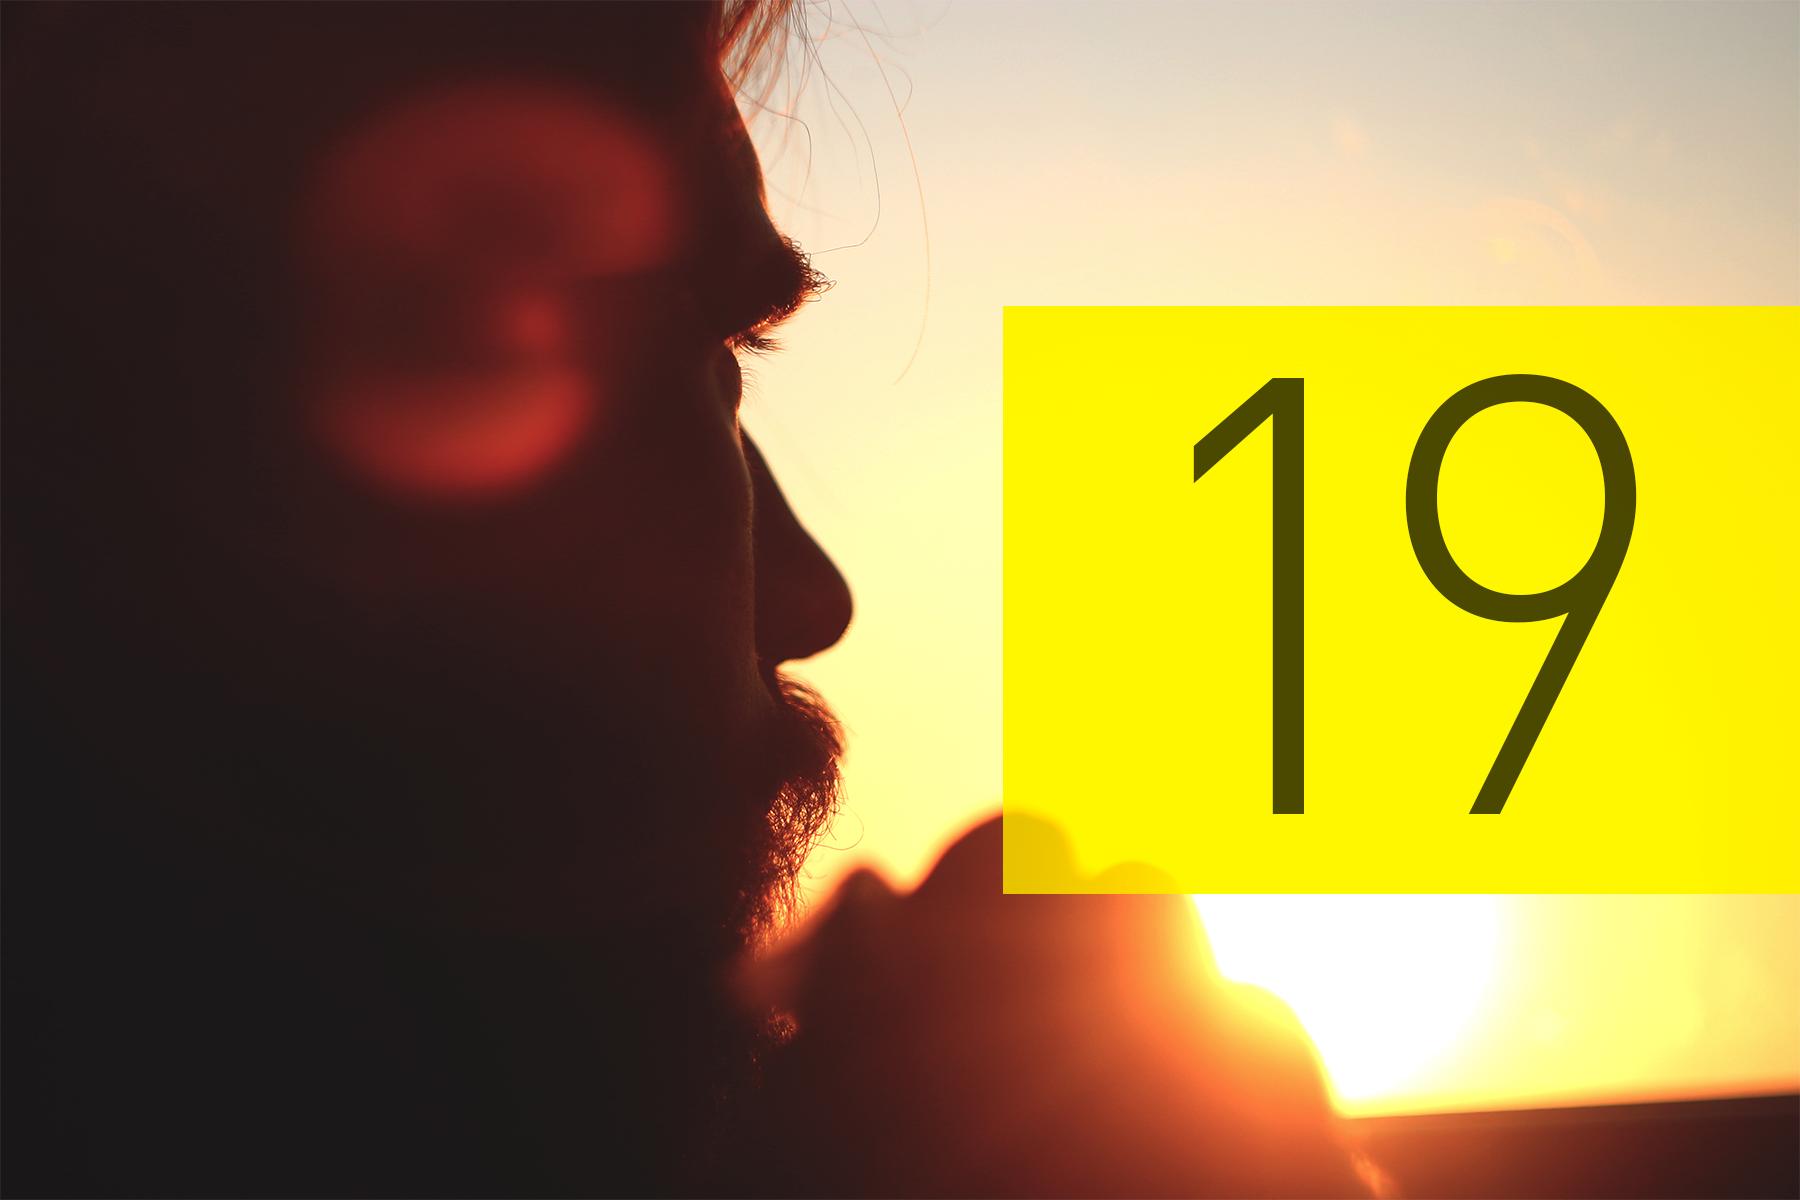 Challenge 19 – Reflection